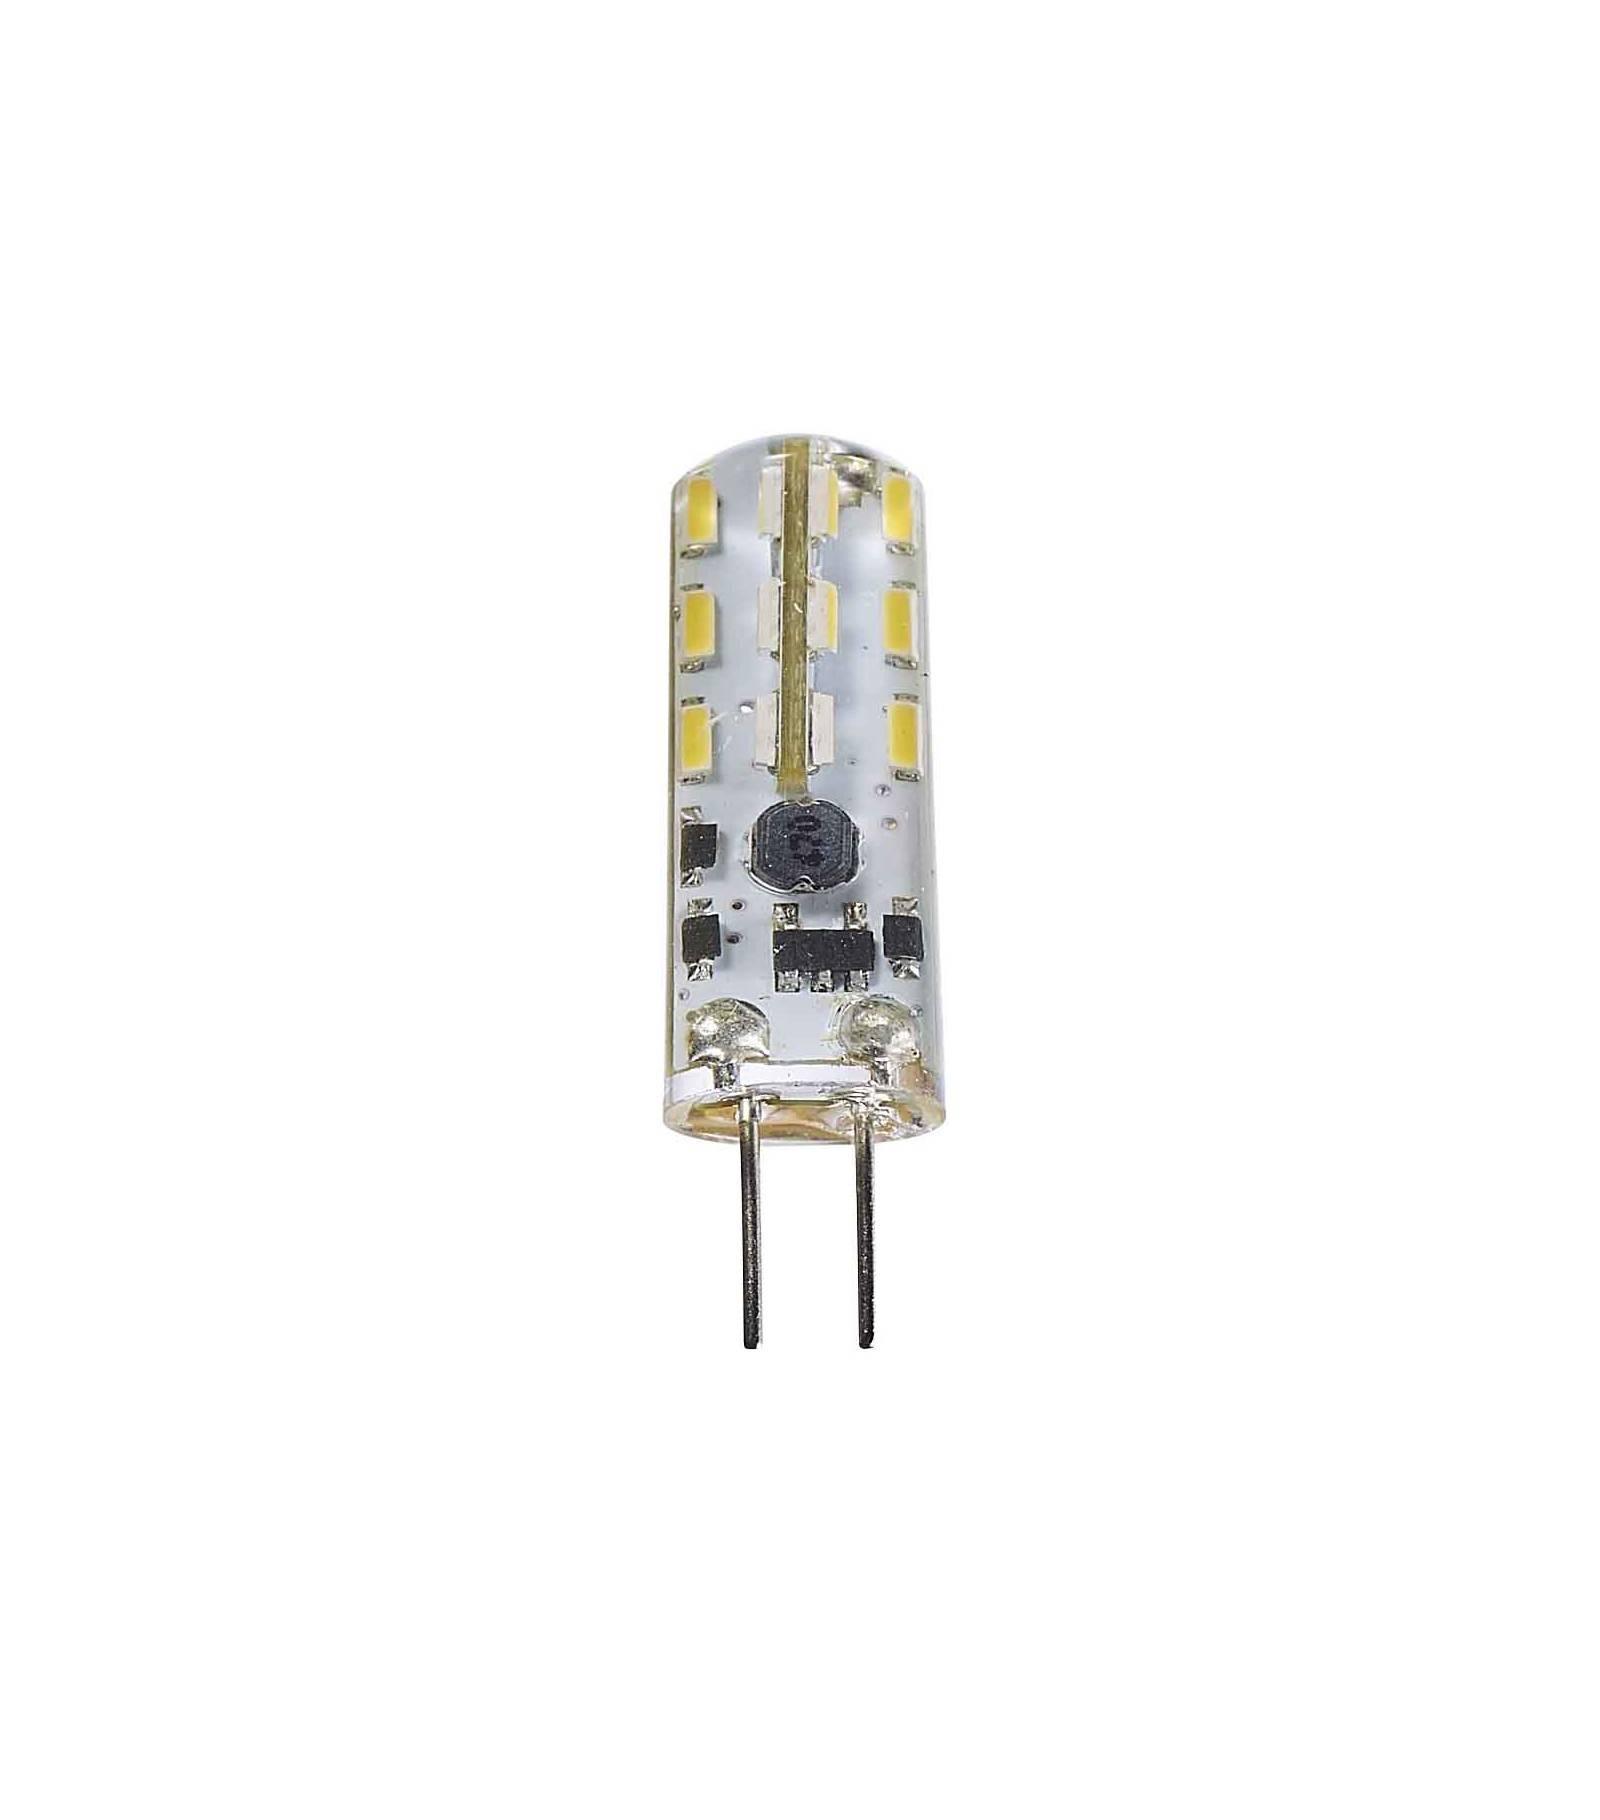 Ampoule Led G4 12v 10w.Ampoule Led G4 A 24 Smd 1 3w 90lm Equiv 10w Blanc Chaud 360 12v Hipow